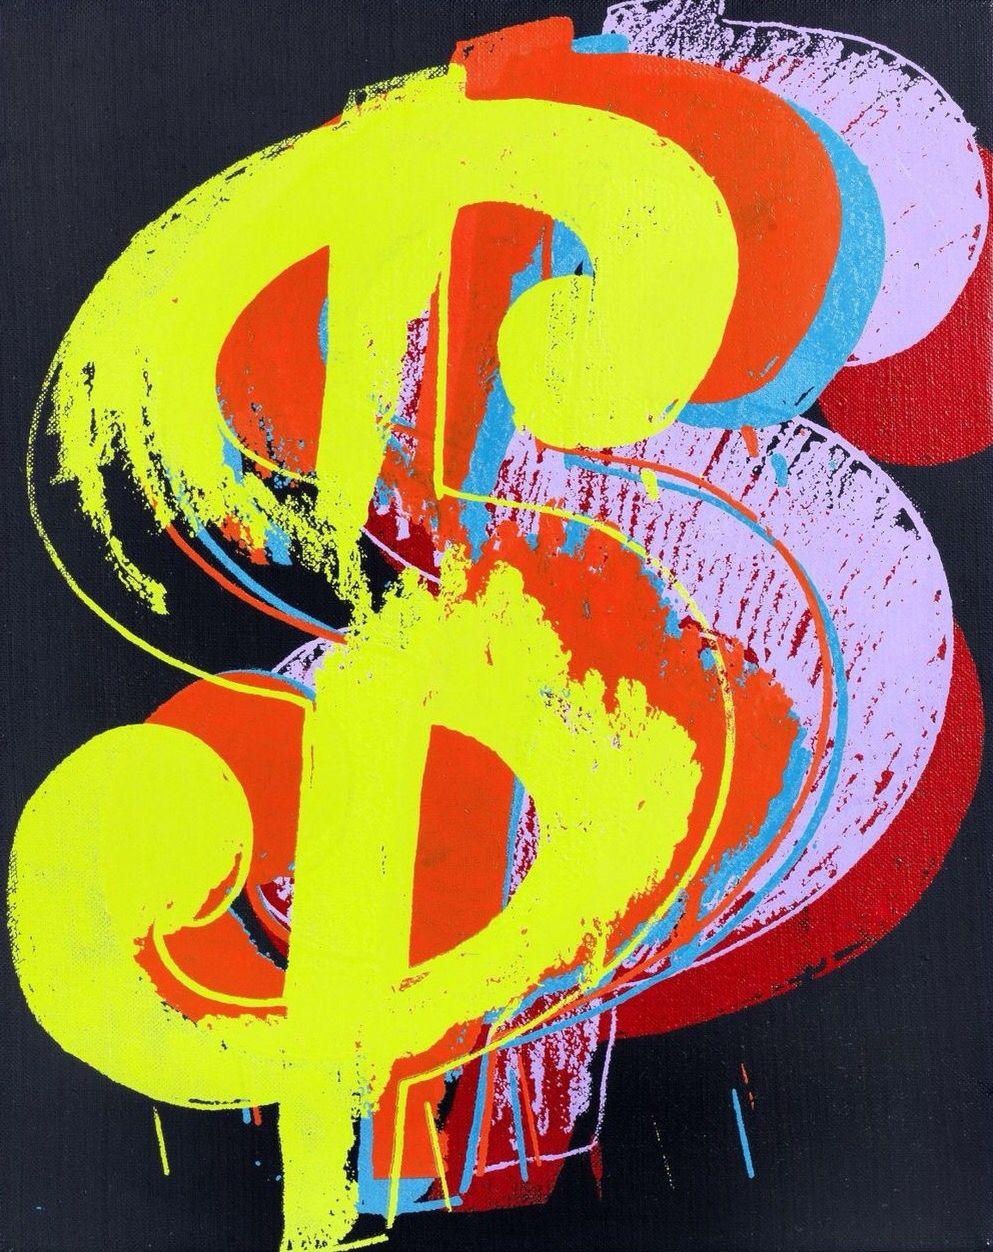 Dollar sign 1982 andy warhol pop art art for sale